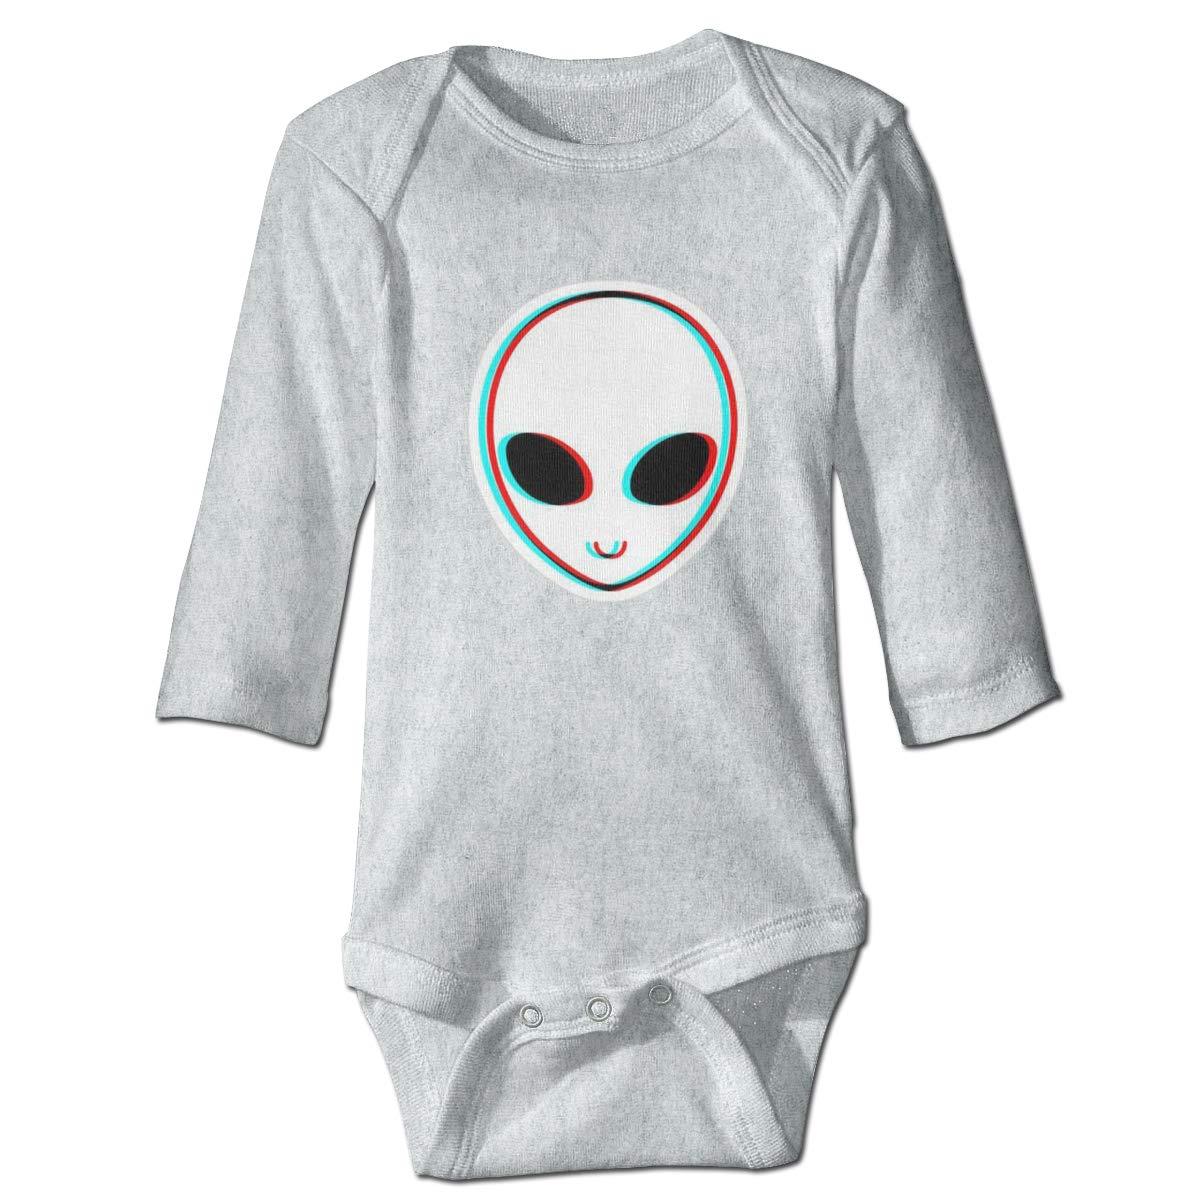 Dfenere Trippy Alien Hip Hop Newborn Baby Long Sleeve Bodysuit Romper Infant Summer Clothing